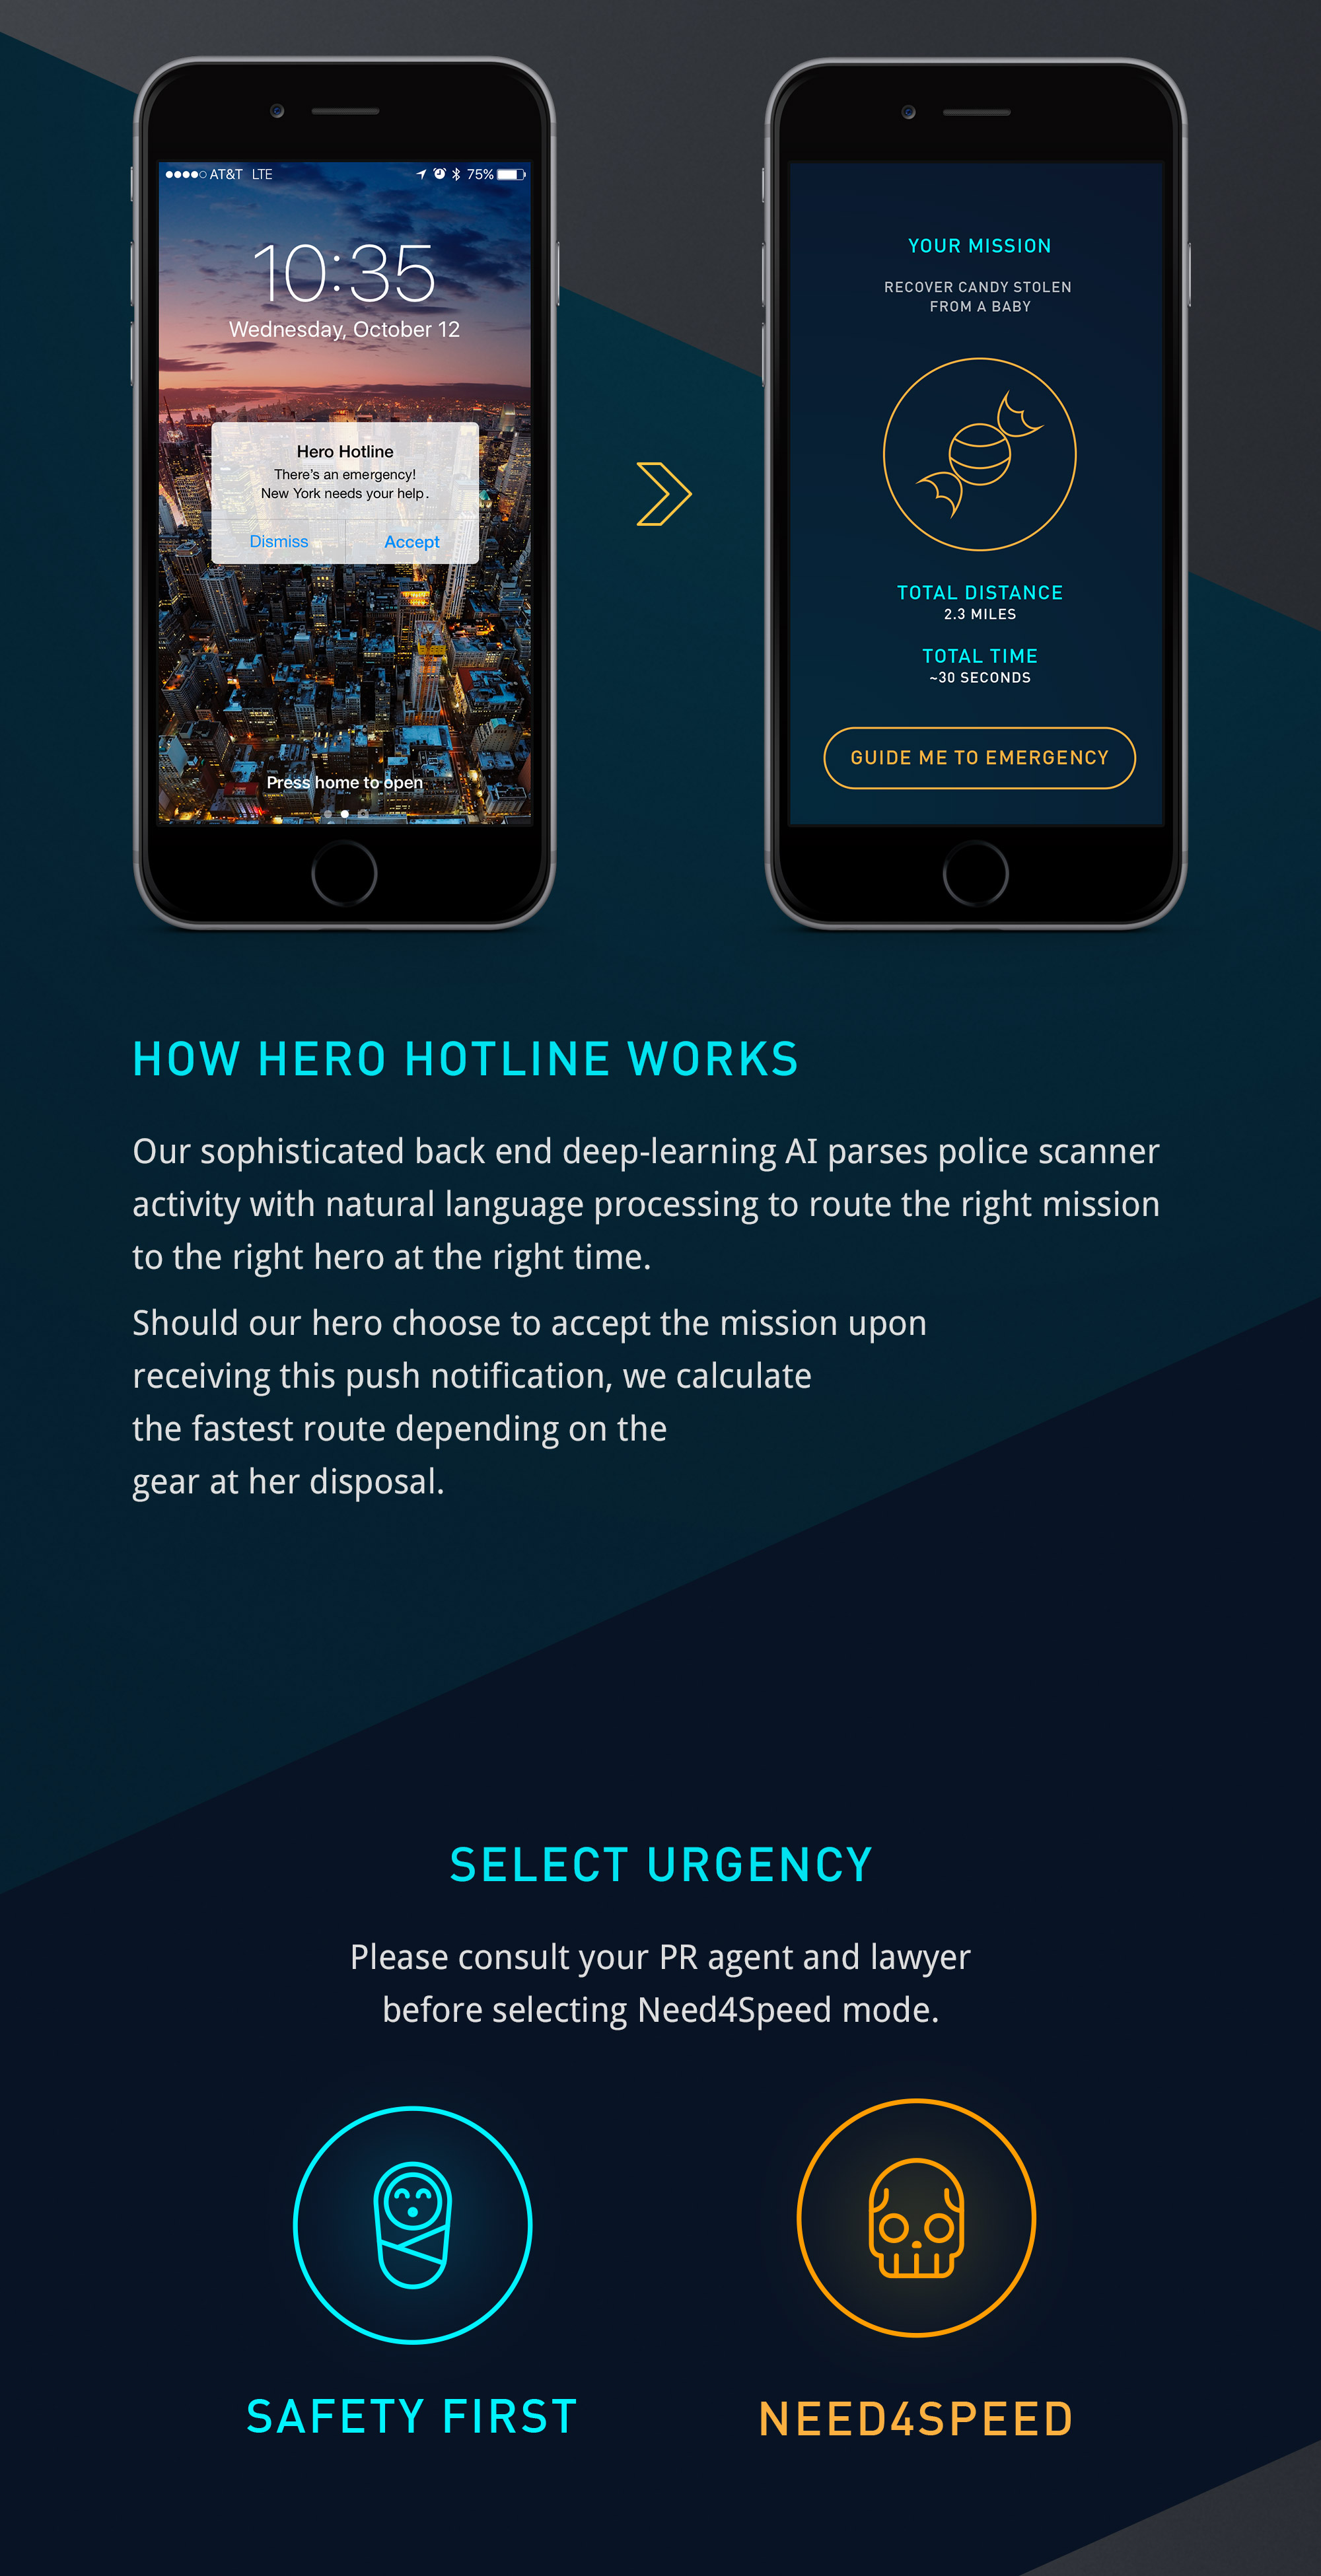 meng-he-herohotline-panel02